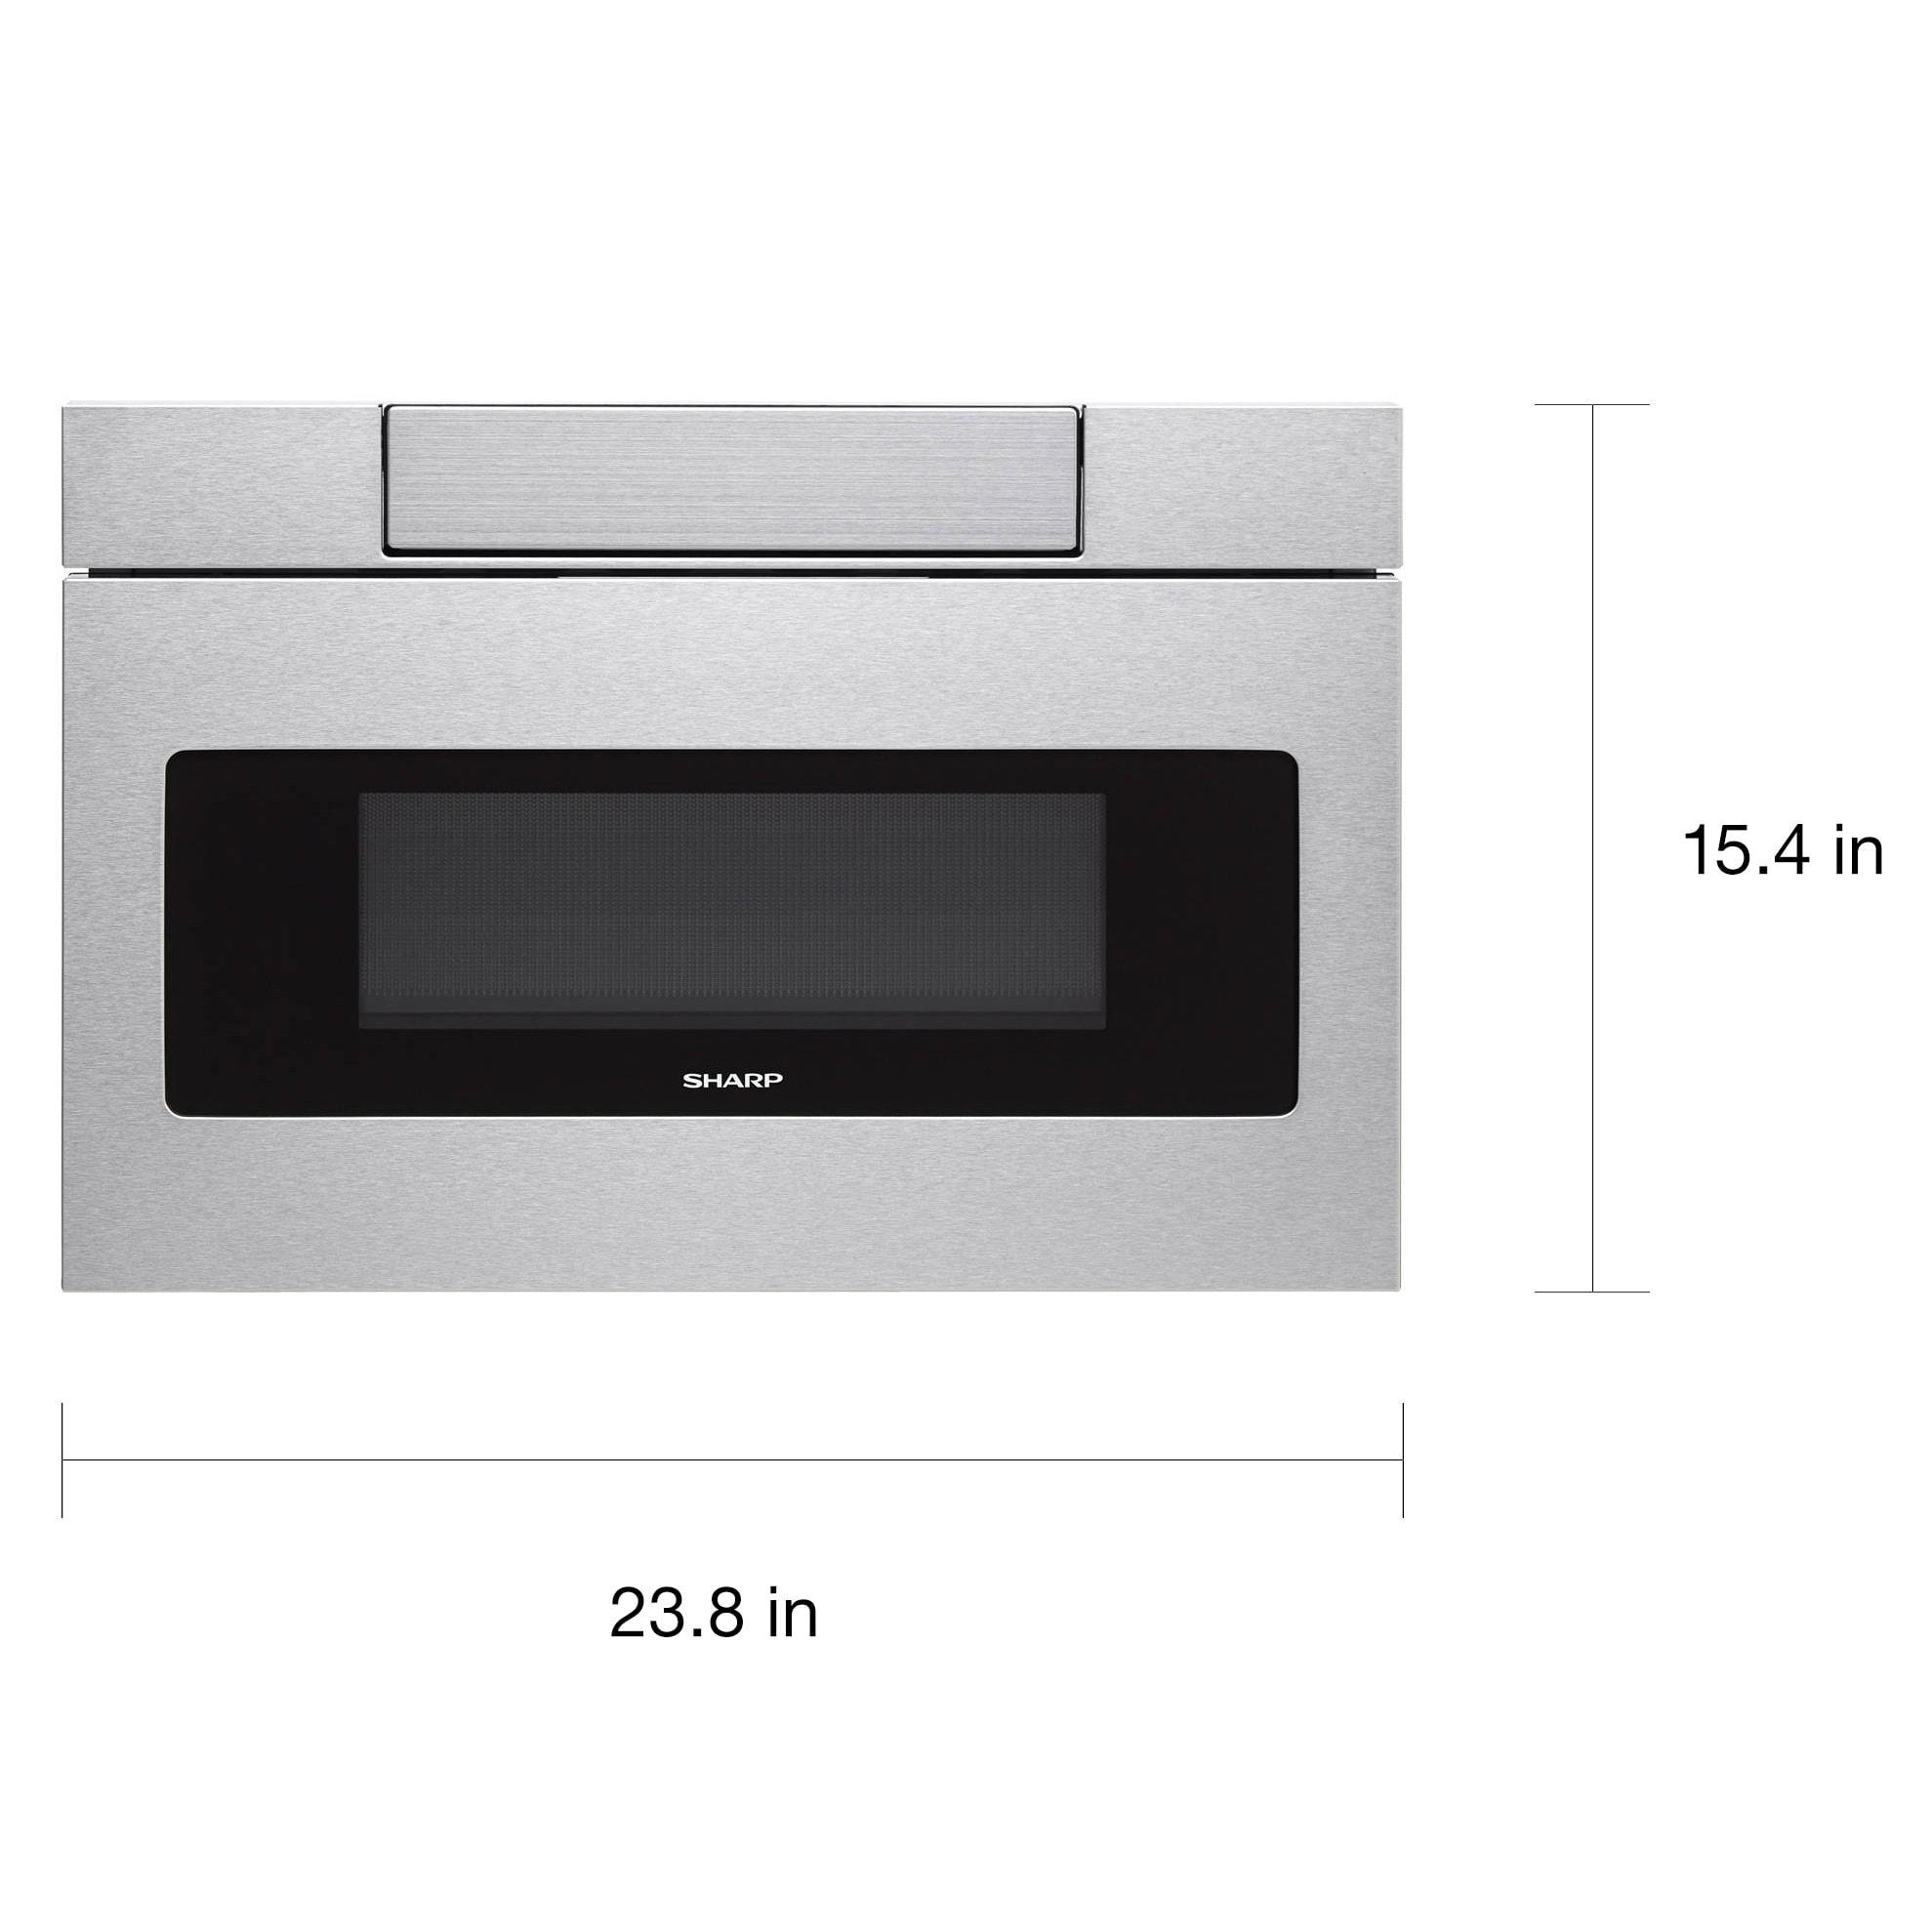 foot cubic impressive of watt microwave oven black drawers reviews bella sharp drawer